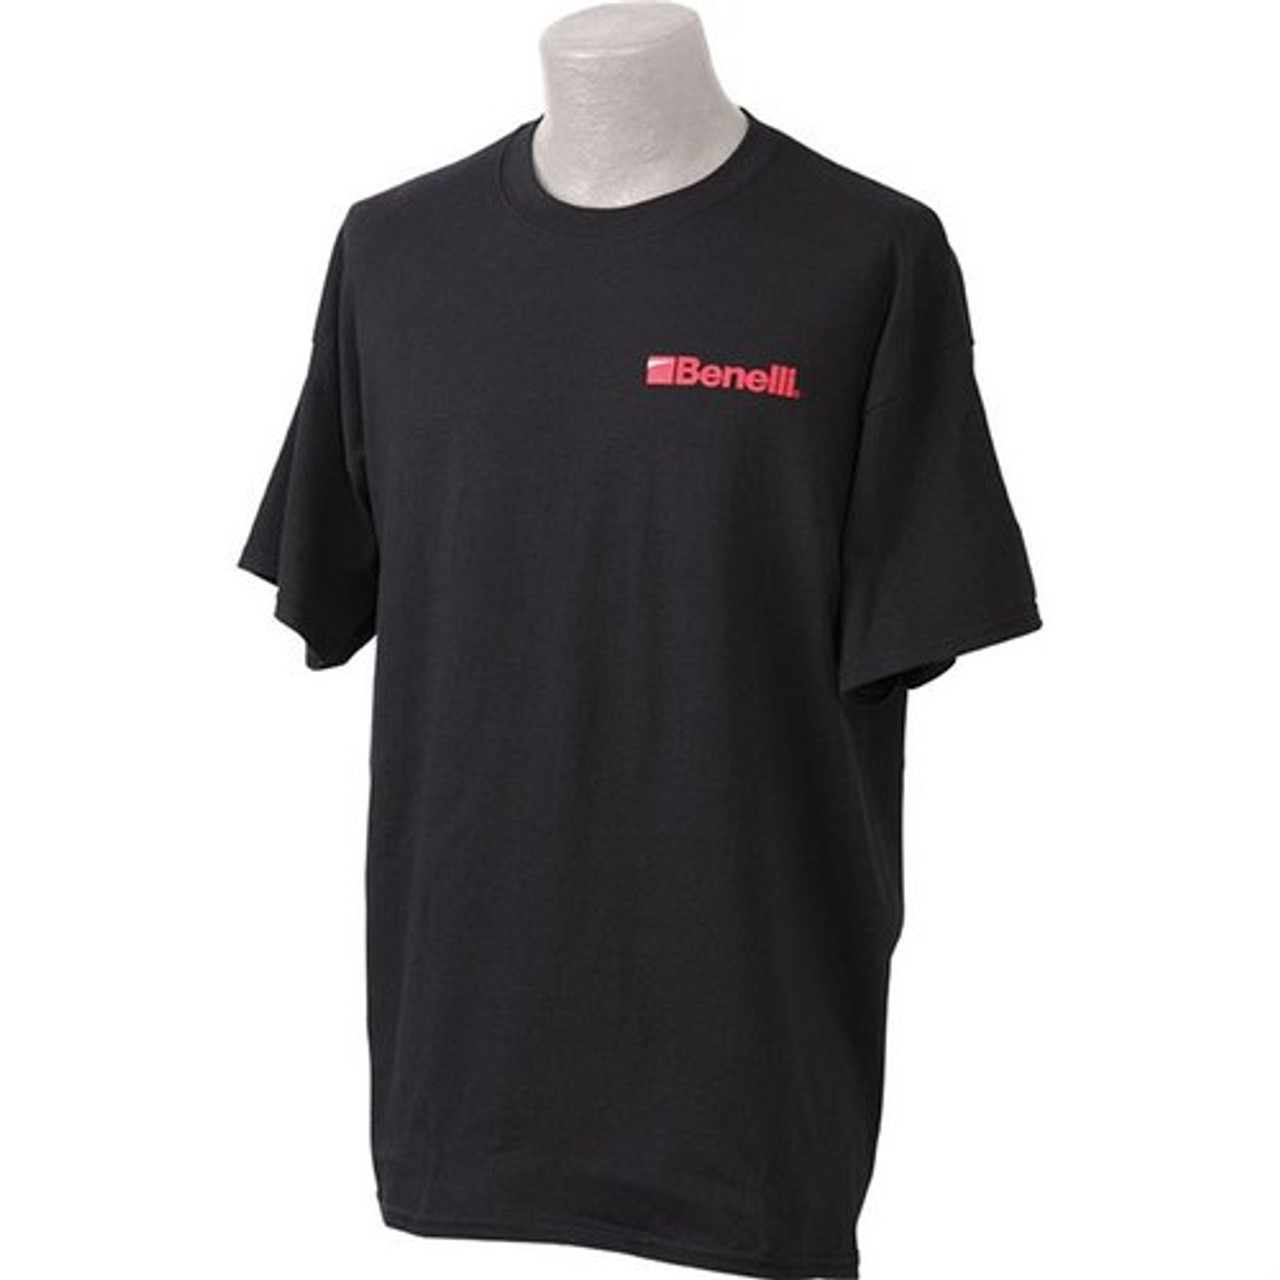 Benelli Short Sleeve Logo T Shirt Black Red Medium 93002M